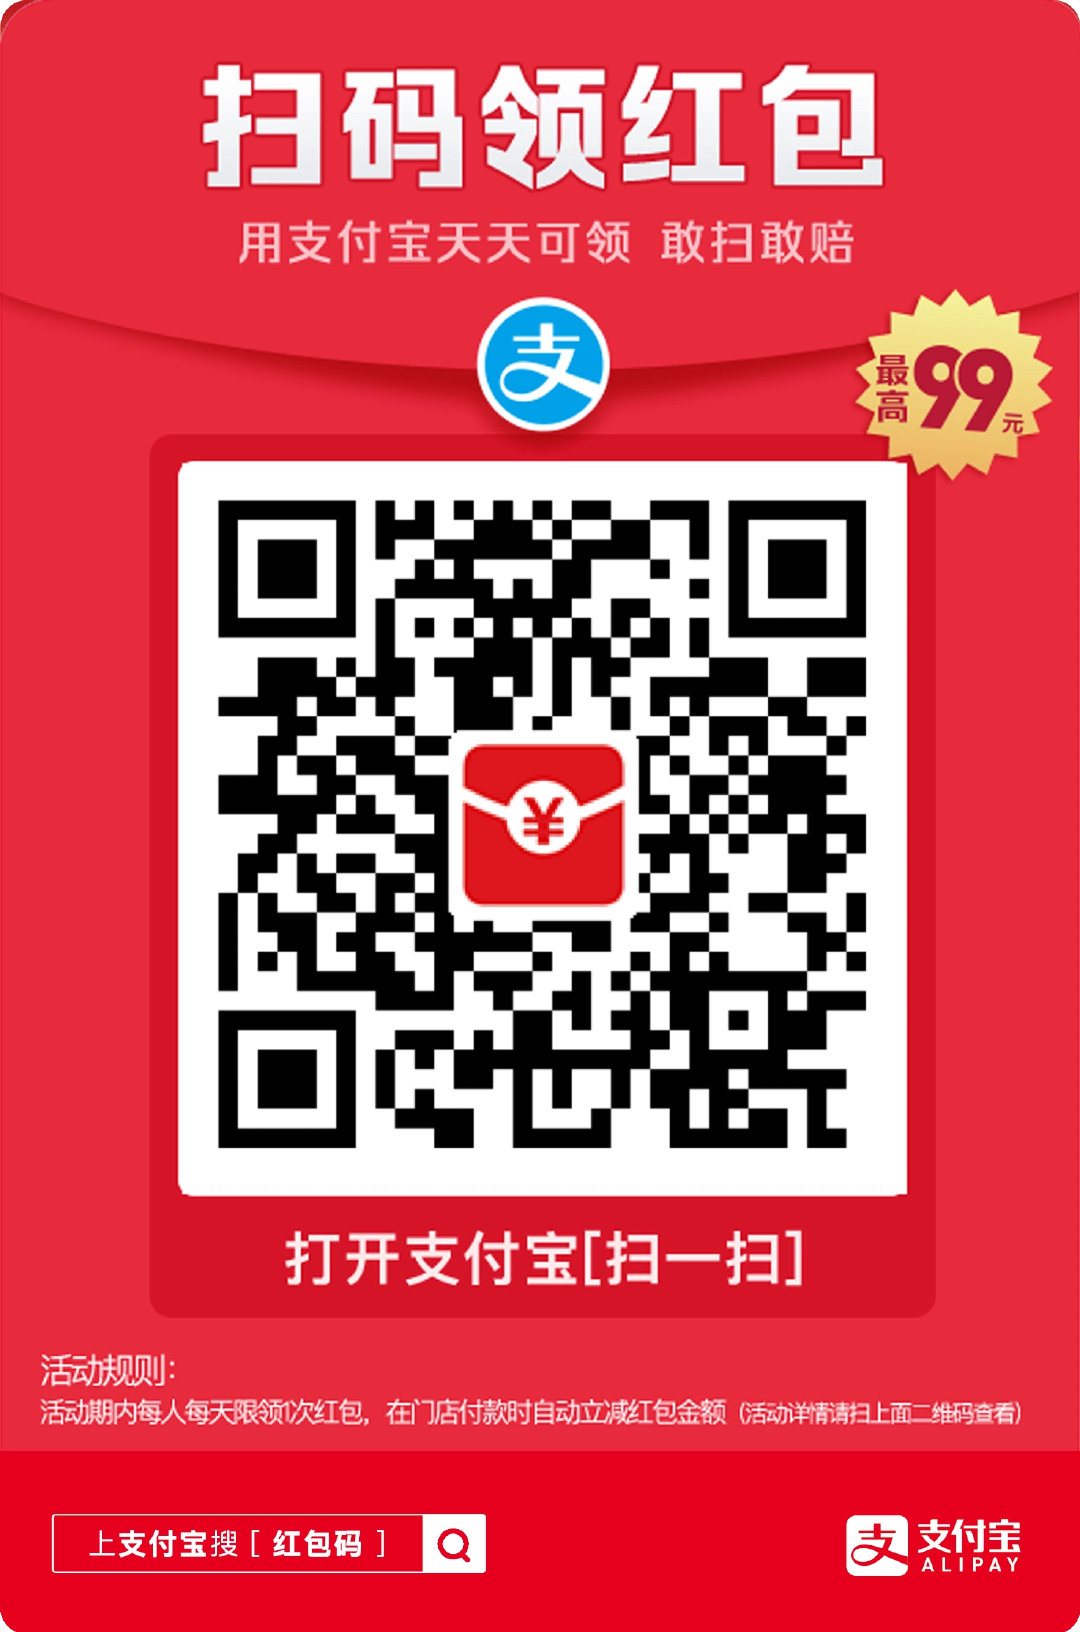 black韩剧百度云哪里有?韩剧black第9集高清中字免费观看app有吗?